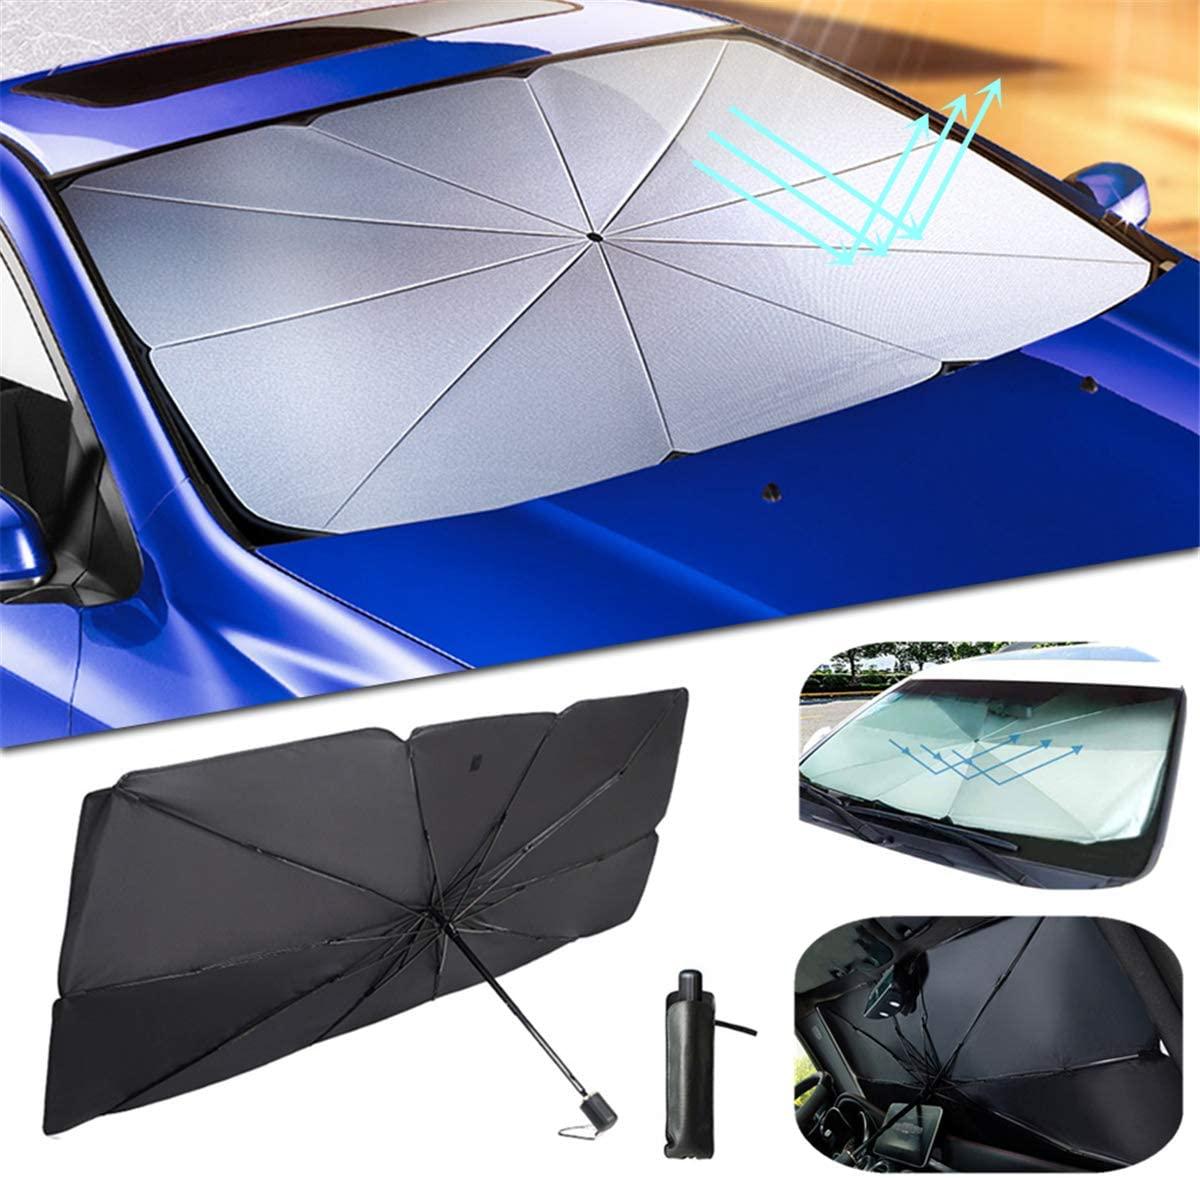 ytbmhhuoupx Car Windshield Sun Shade for Subaru Tribeca Blocks Rays Sun Umbrella Visor Protector Foldable Reflector Umbrella 31x57in